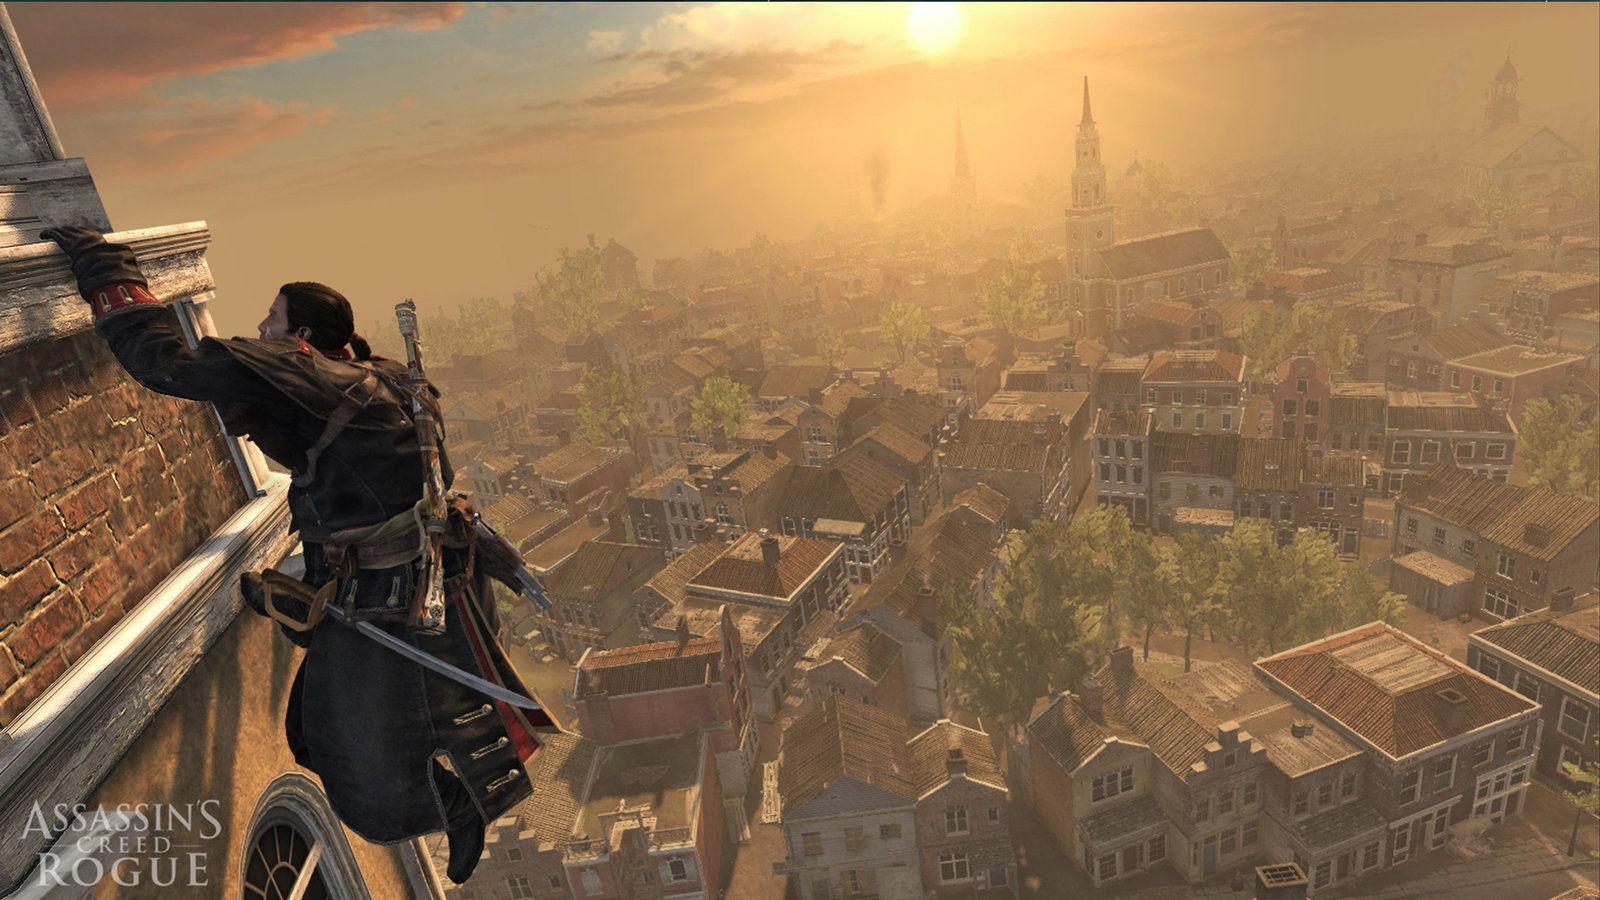 Pohľad na New York zhora (zdroj: Ubisoft)